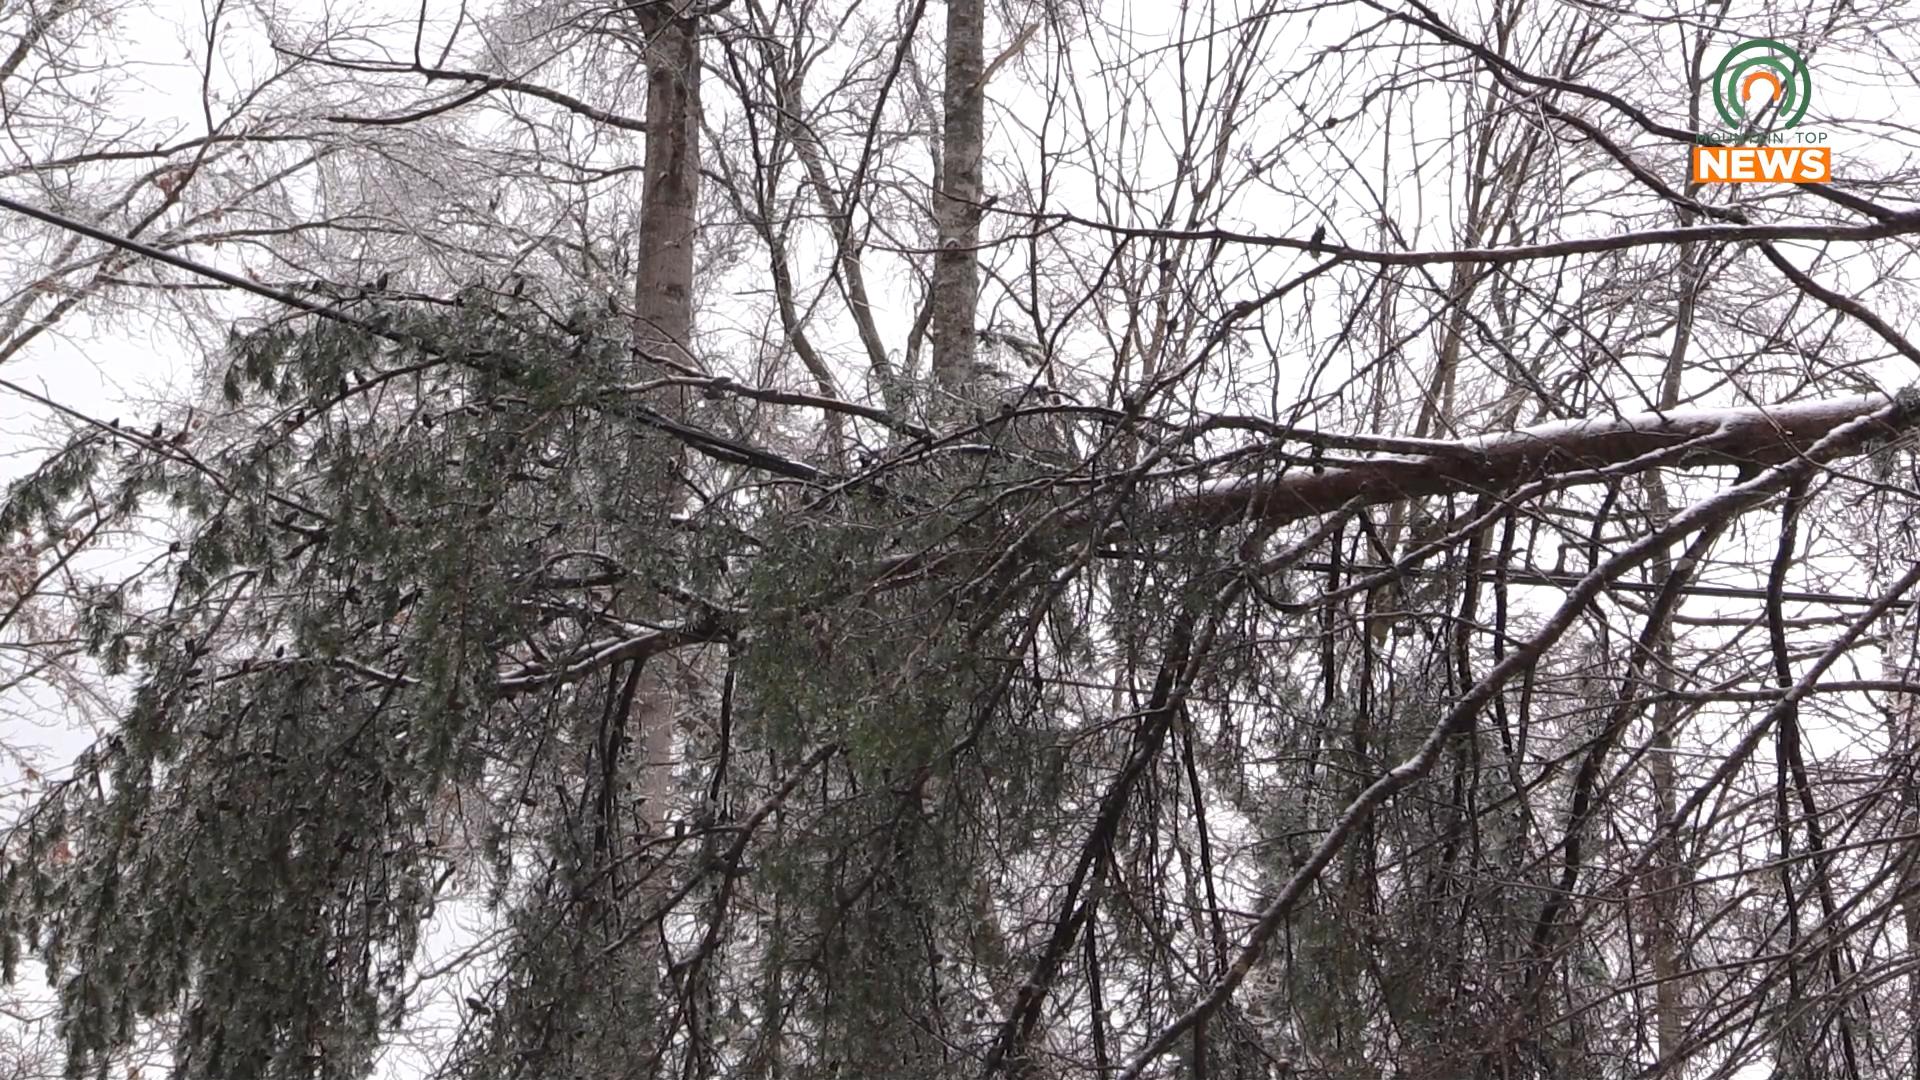 Region braces for third winter storm